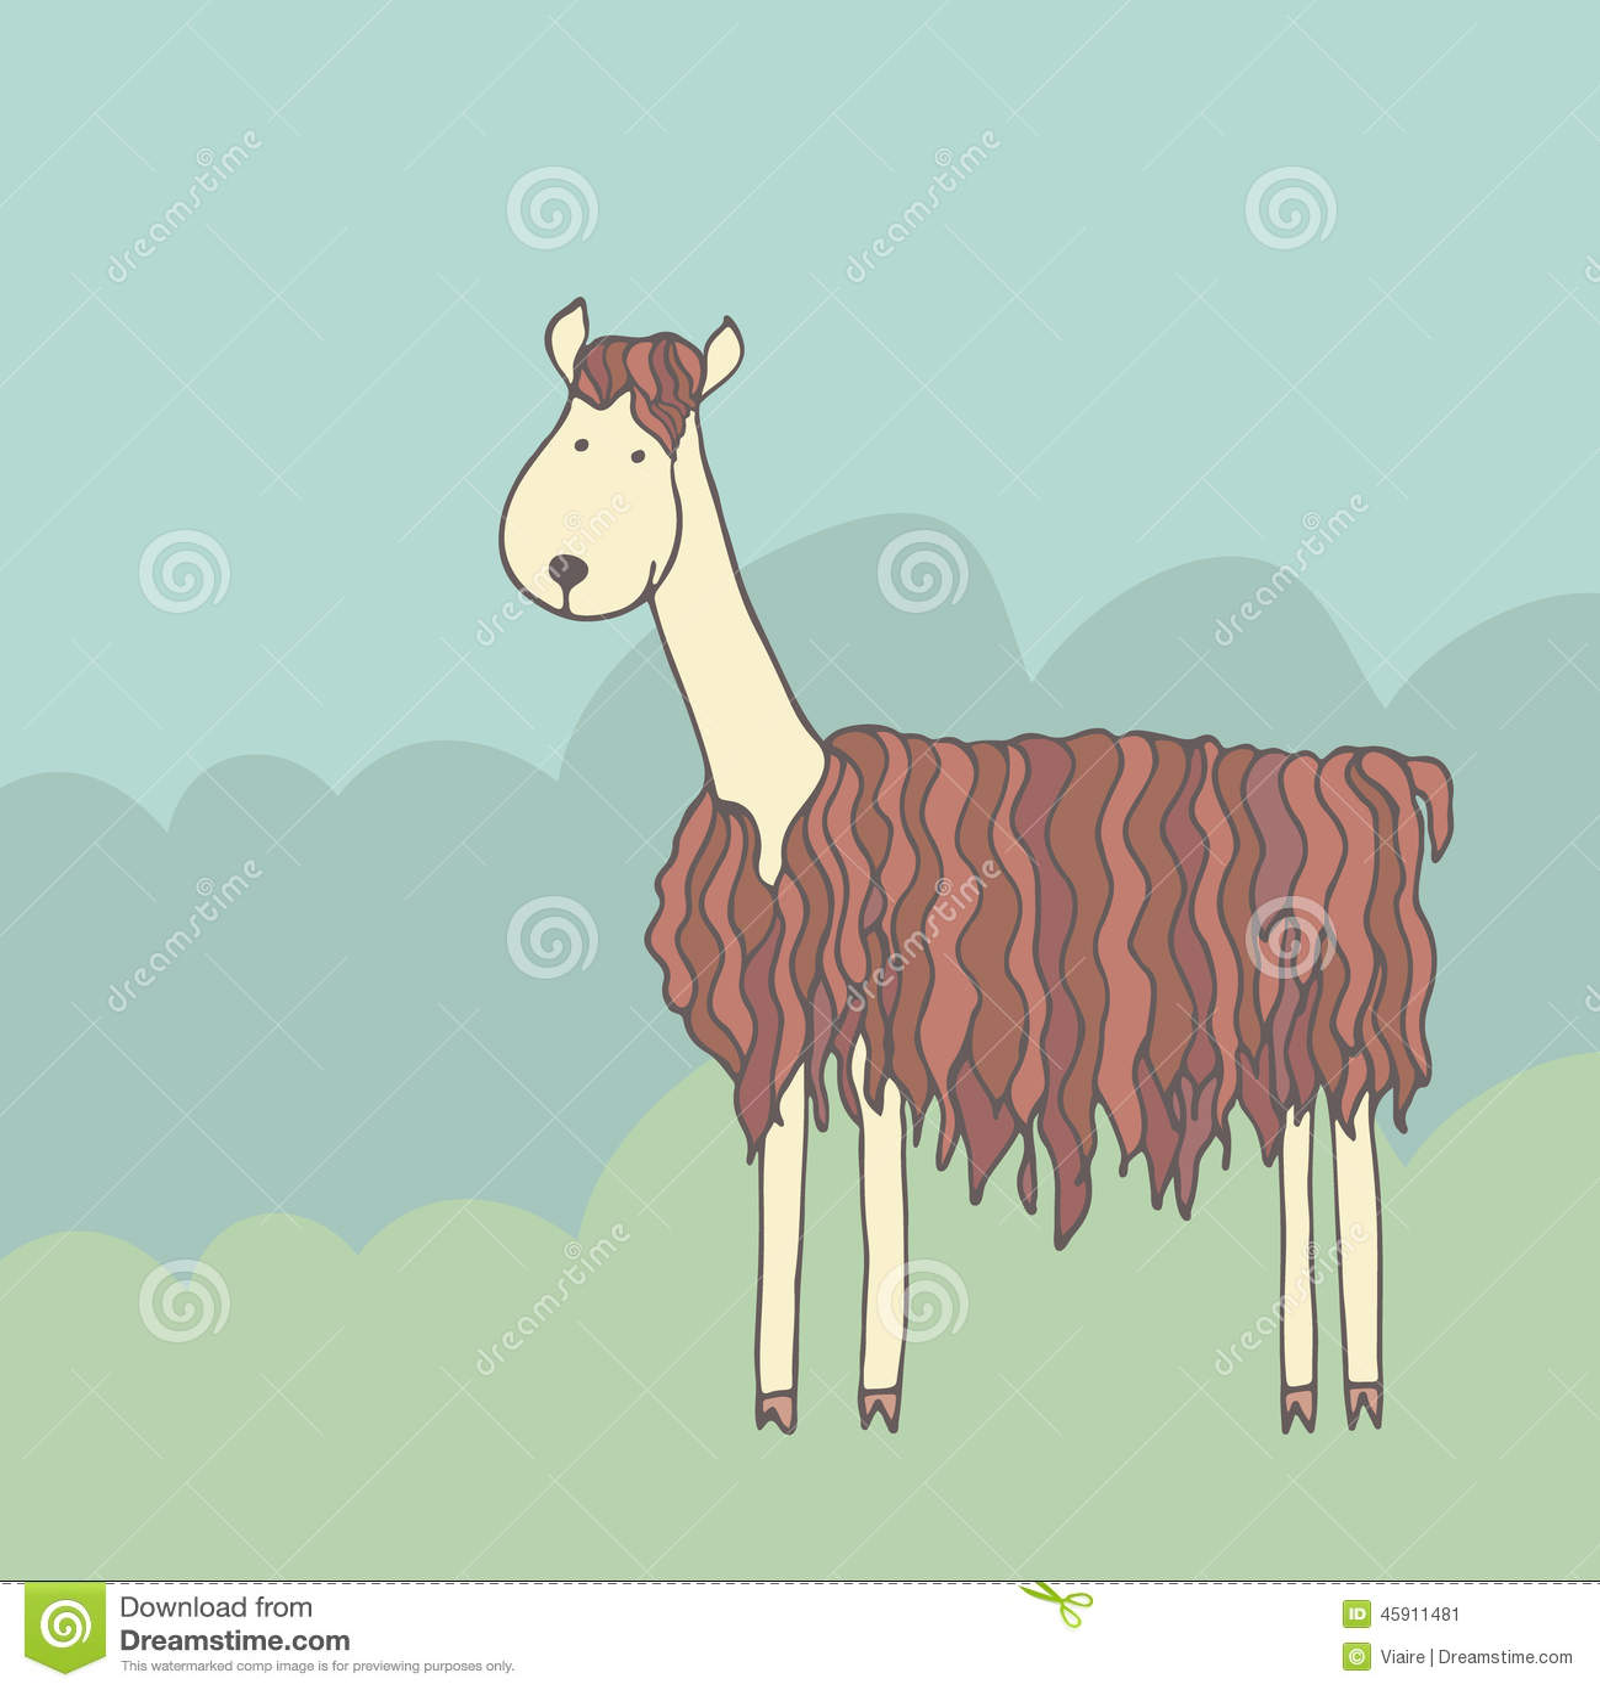 alpaca clipart